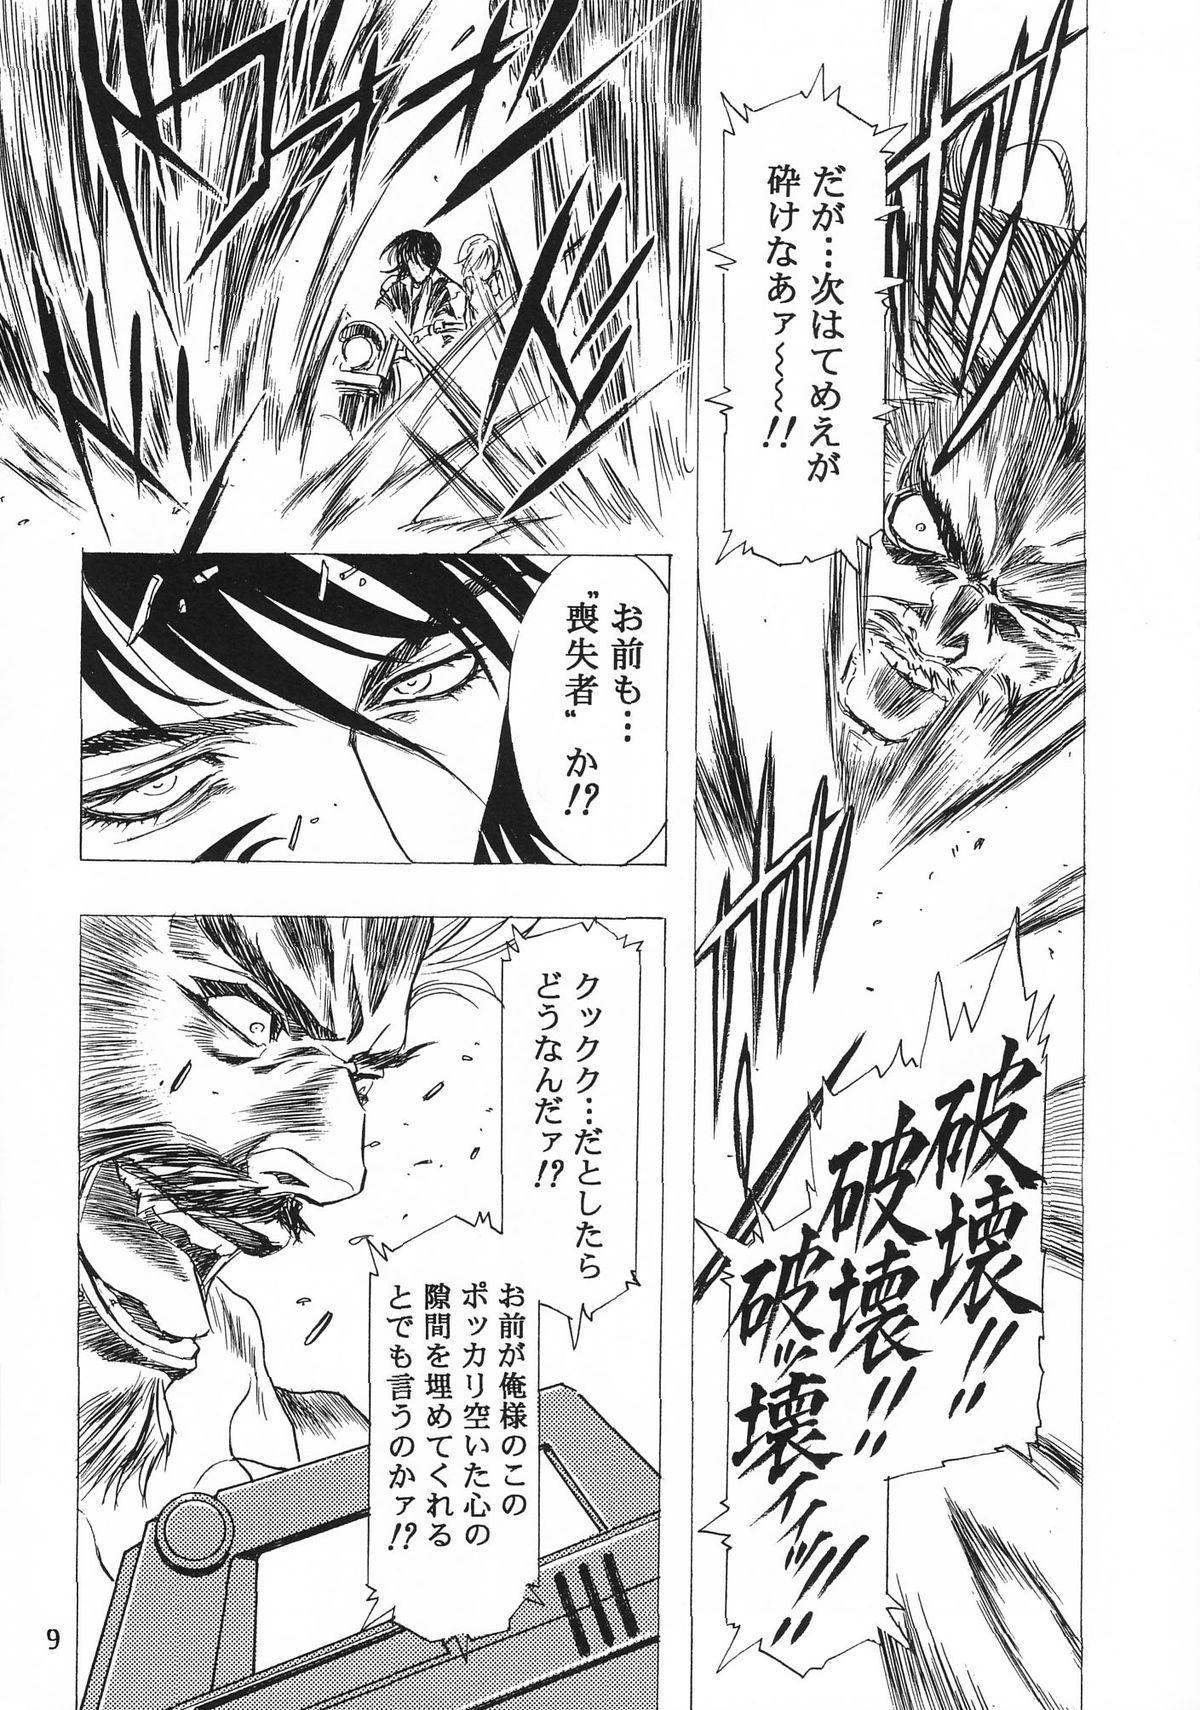 Henrei-kai '98 Natsu SPECIAL 10